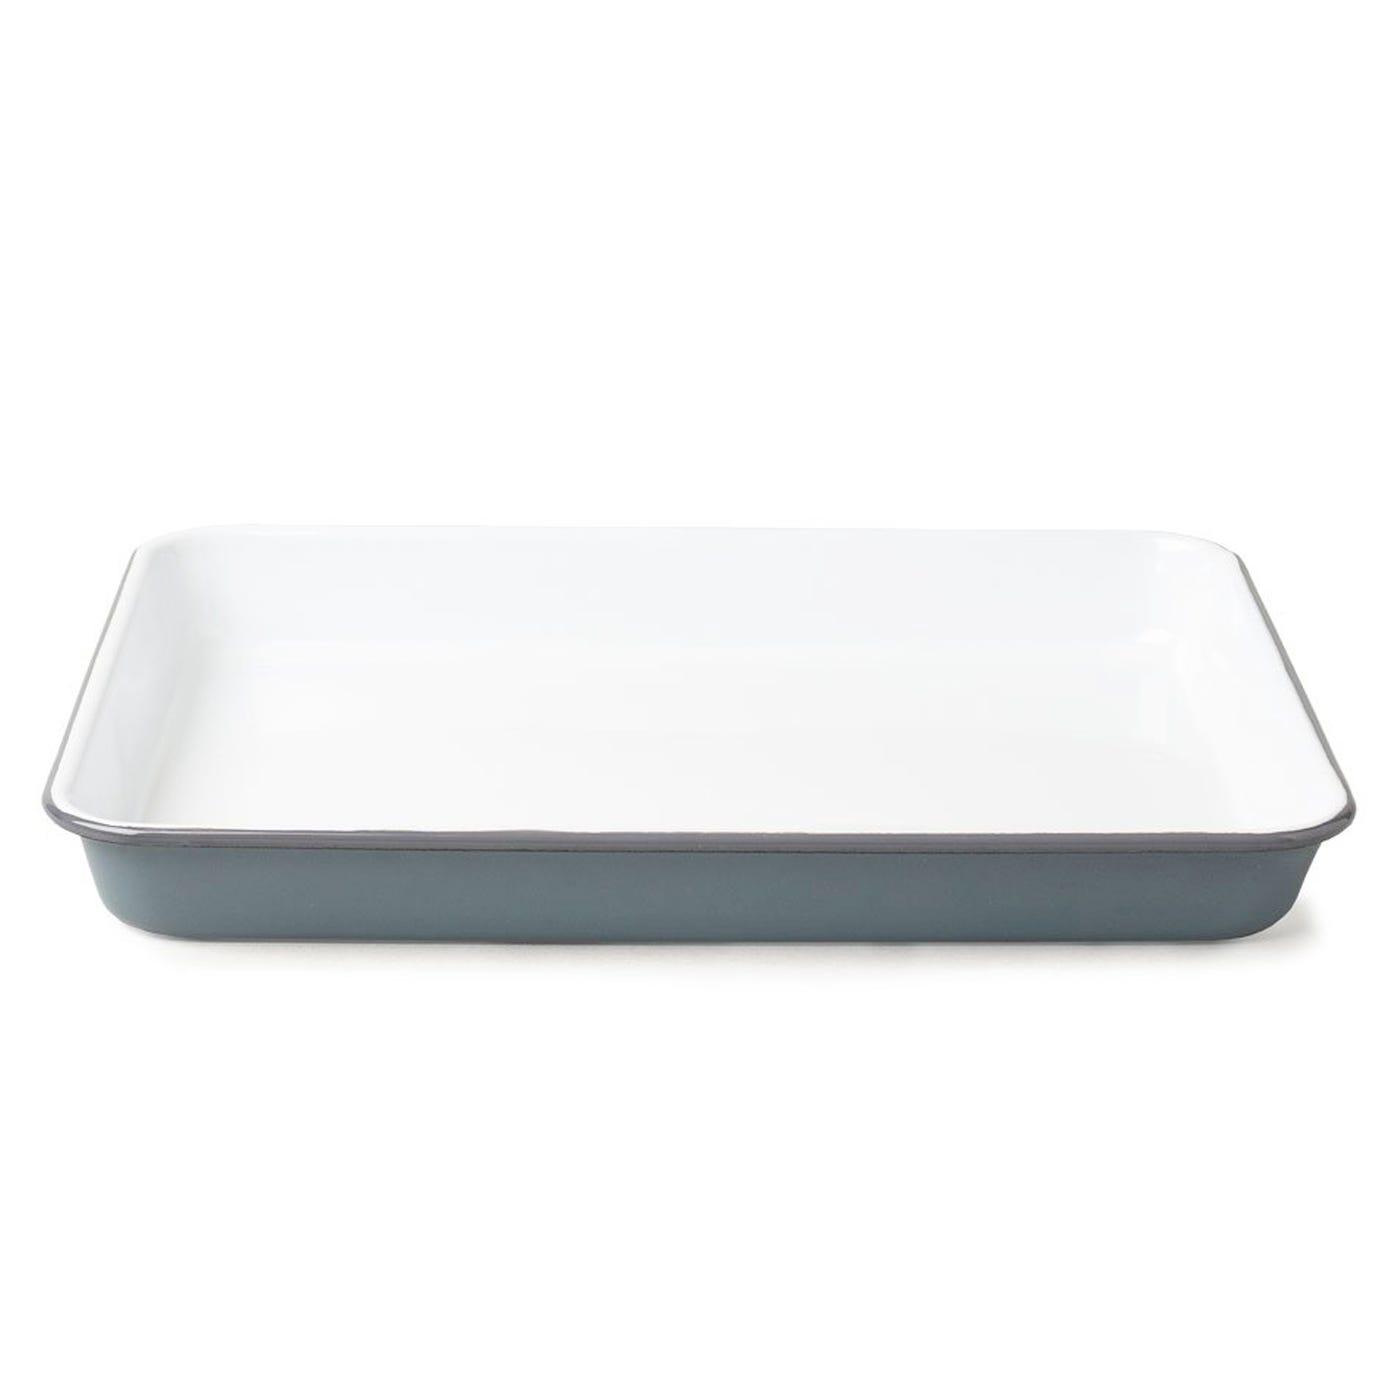 Enamelware Tray